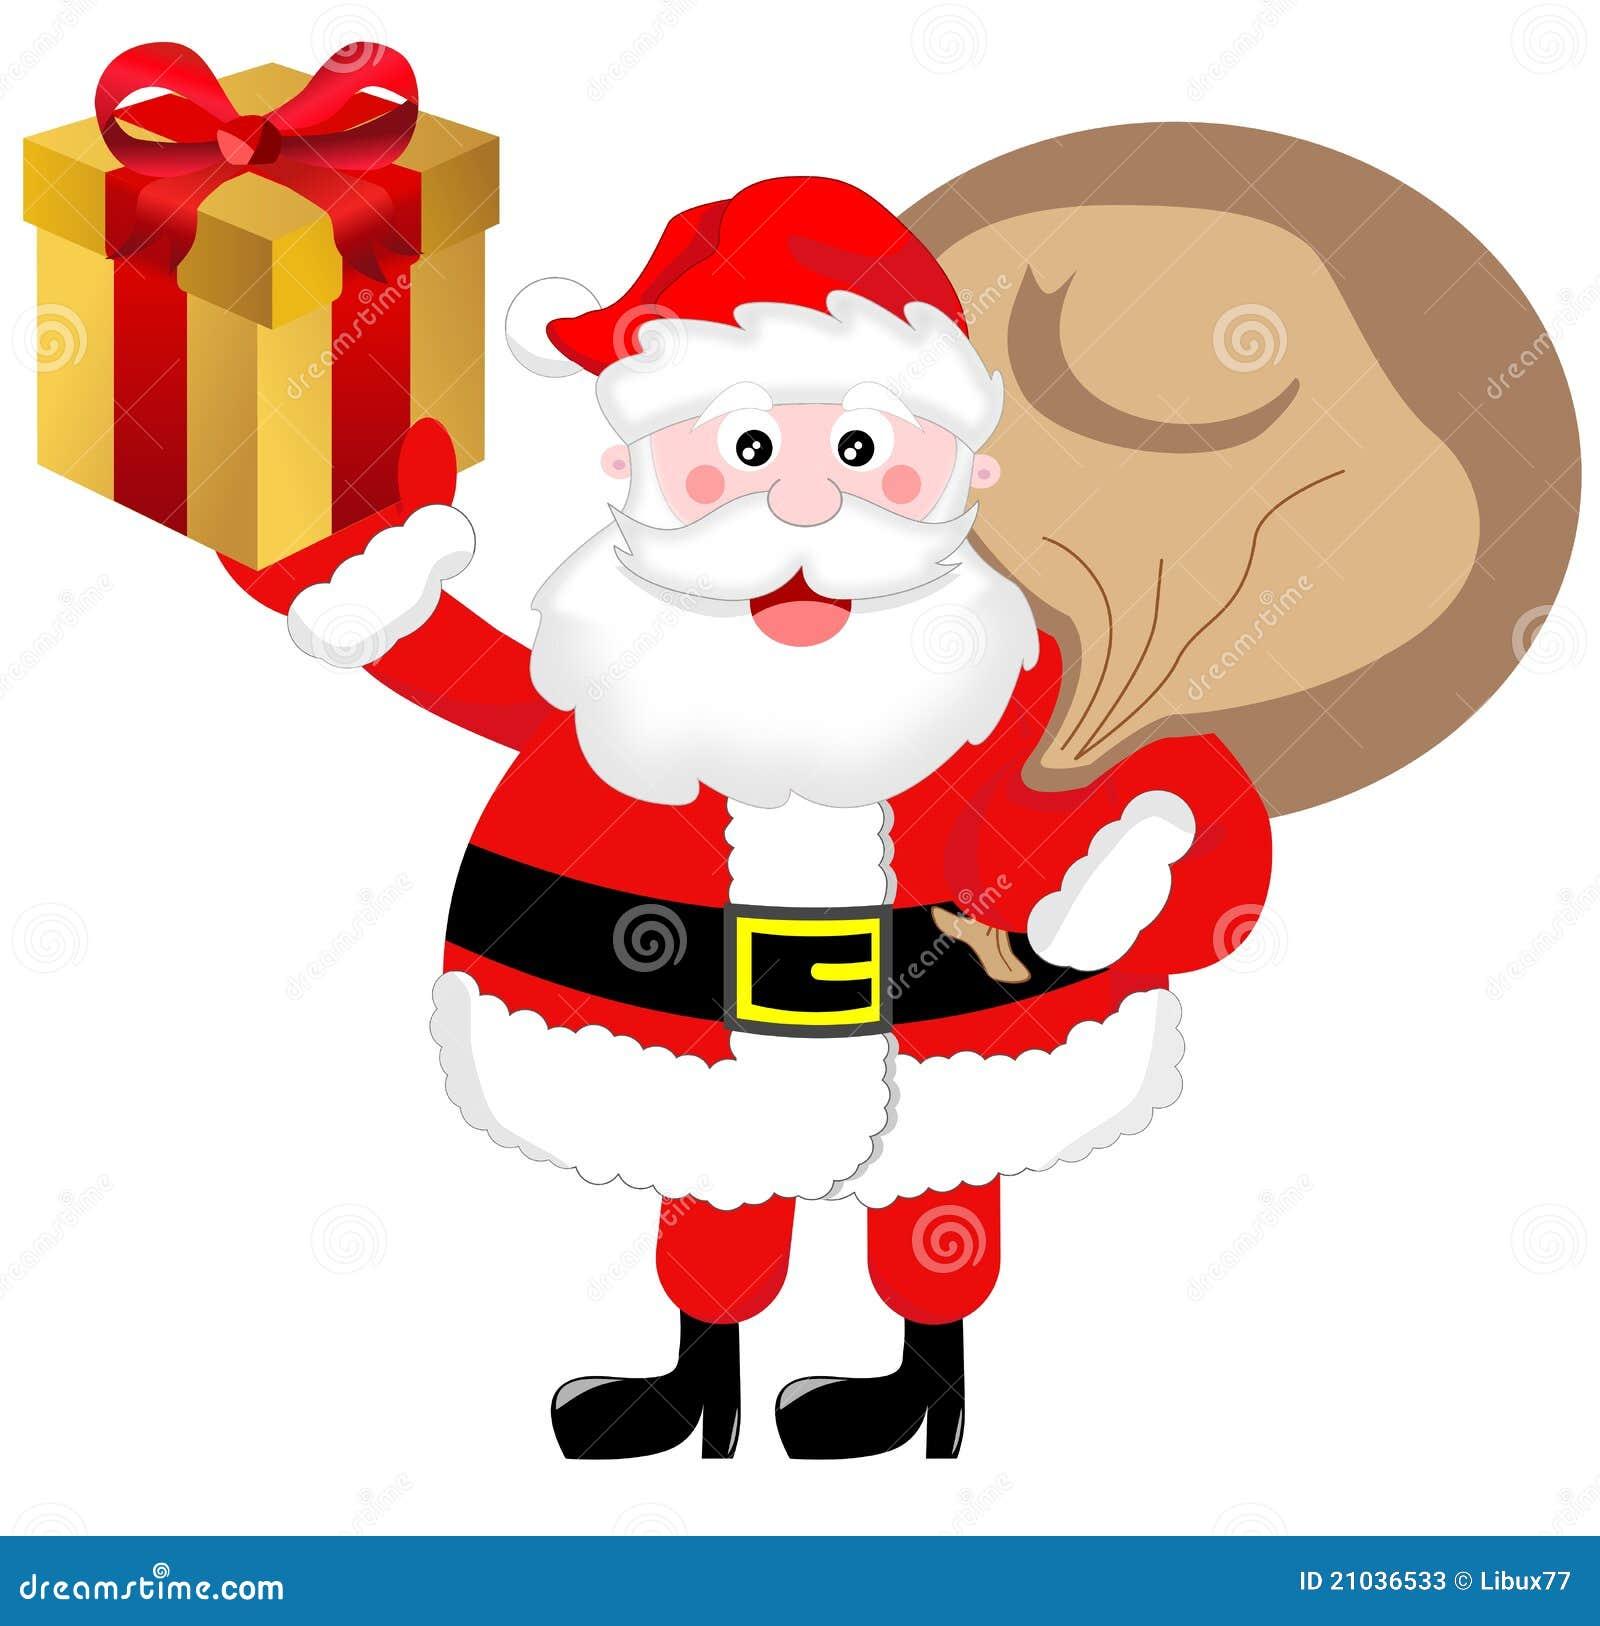 santa claus brings presents - Santa Claus Presents